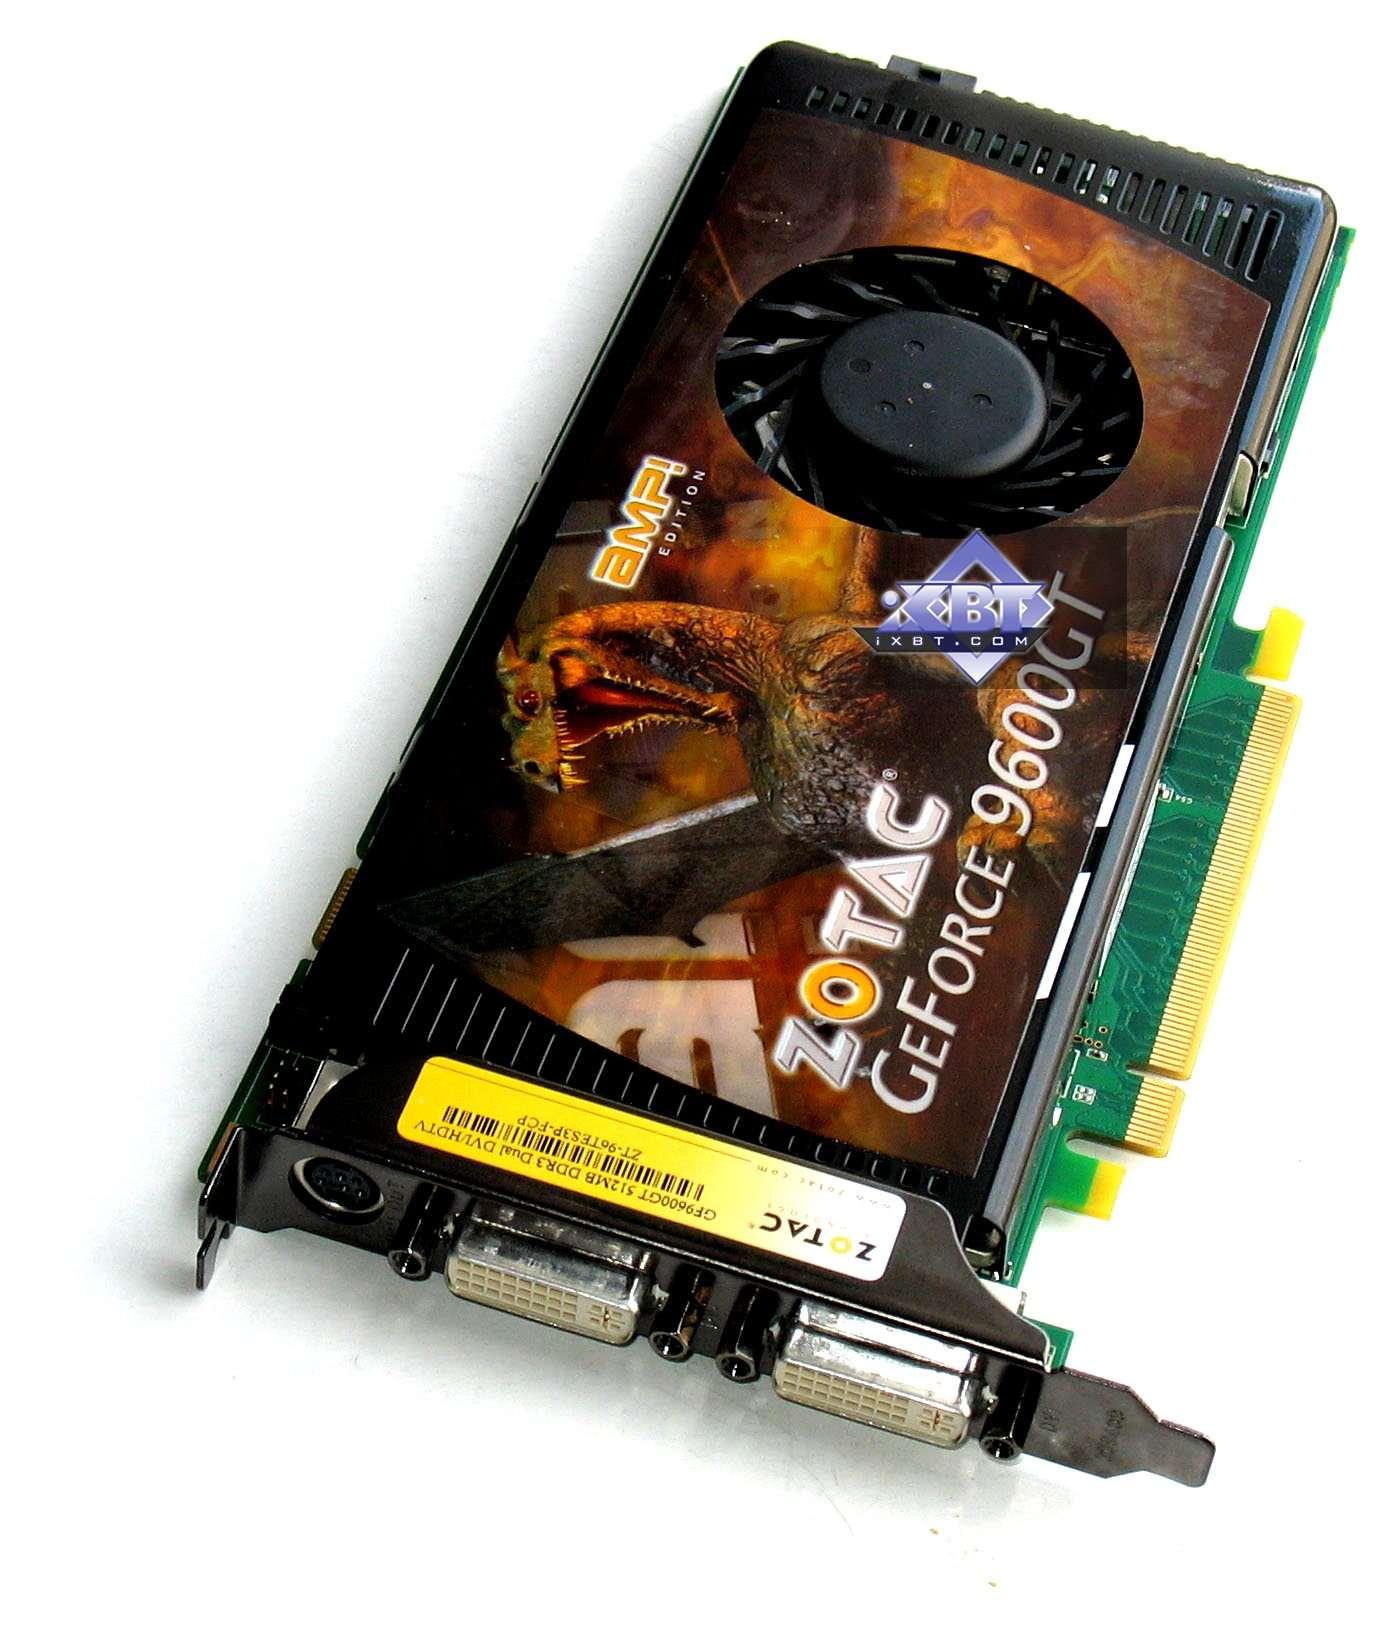 Драйвер nvidia gt 9600.